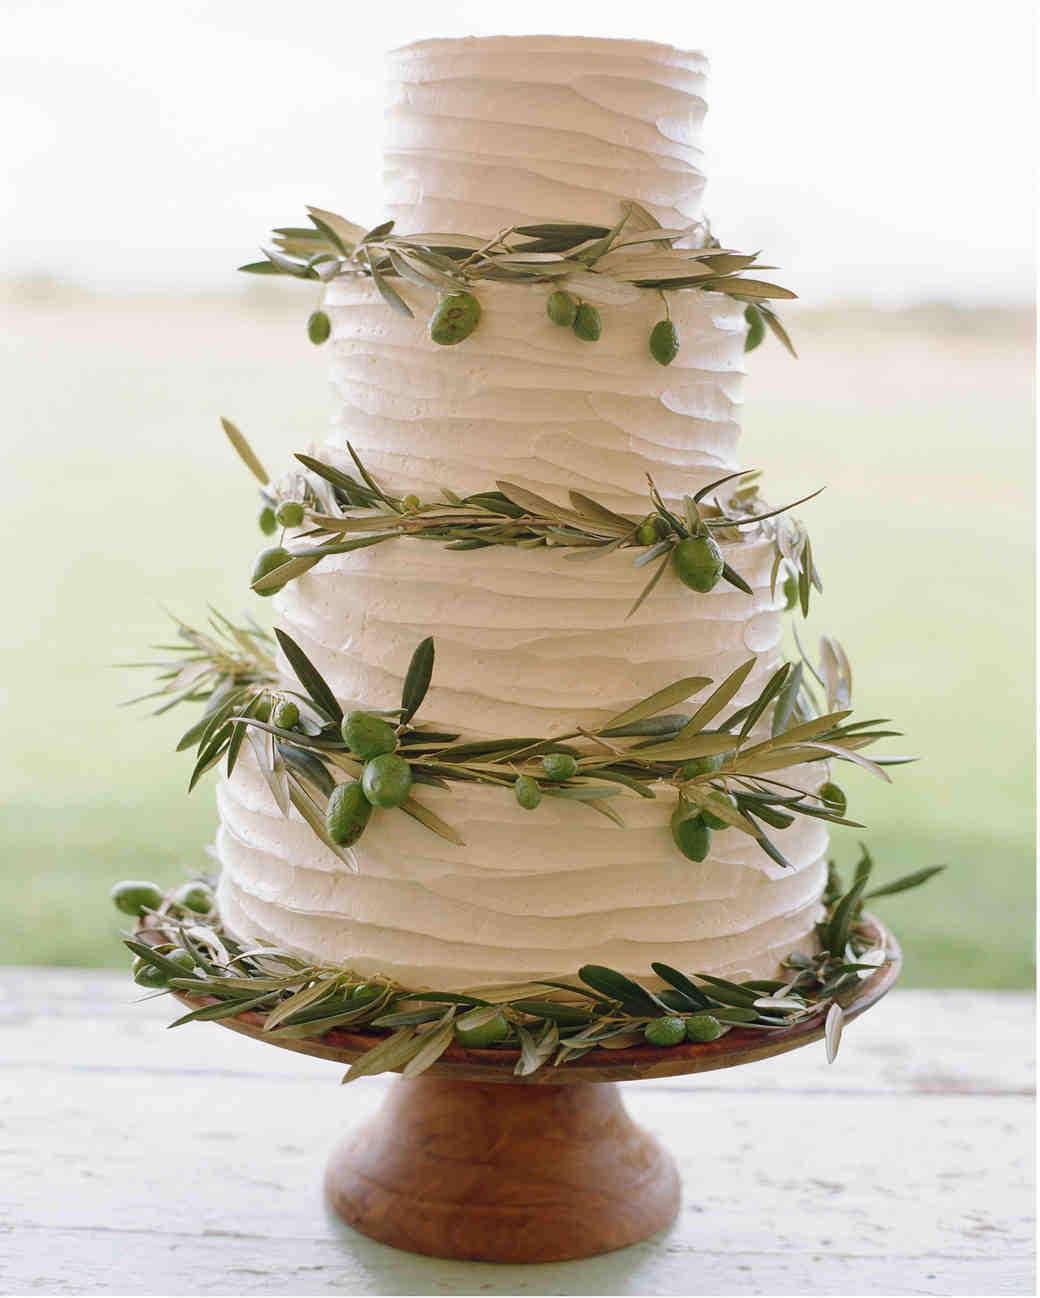 callie-eric-wedding-cake-471-s112113-0815.jpg